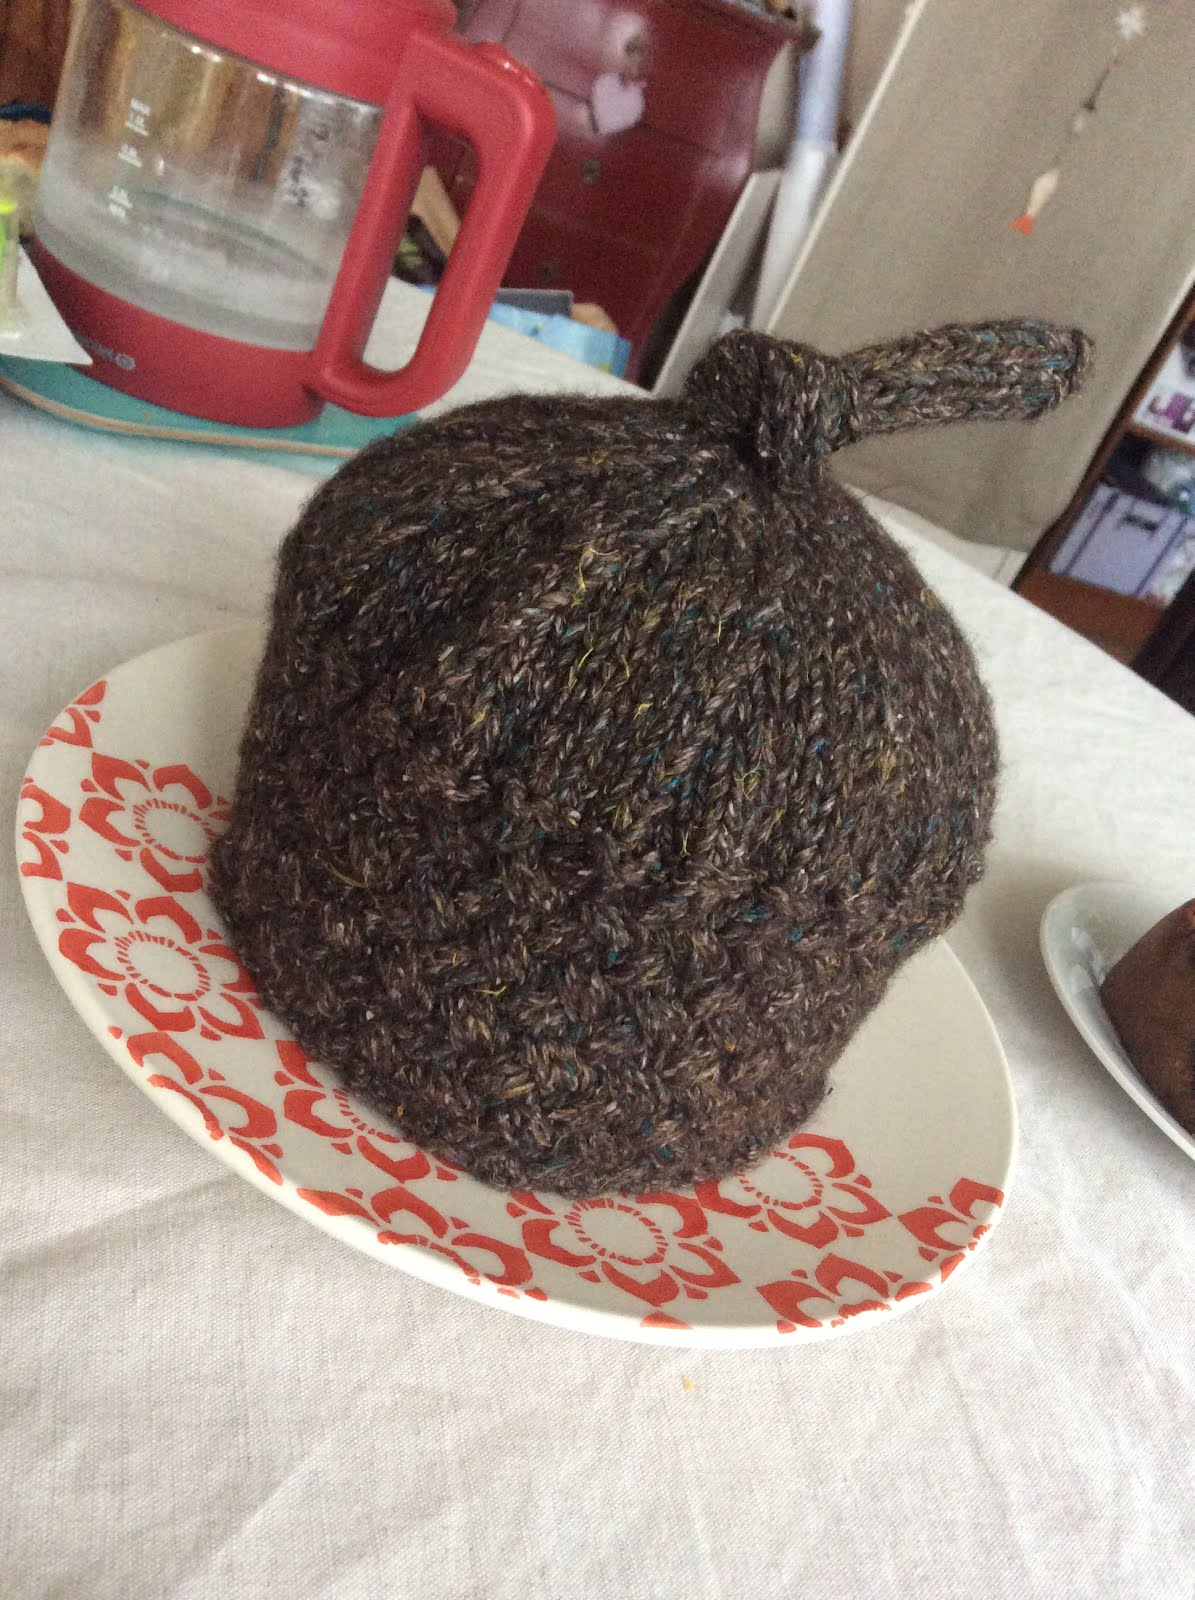 Chocolat pudding